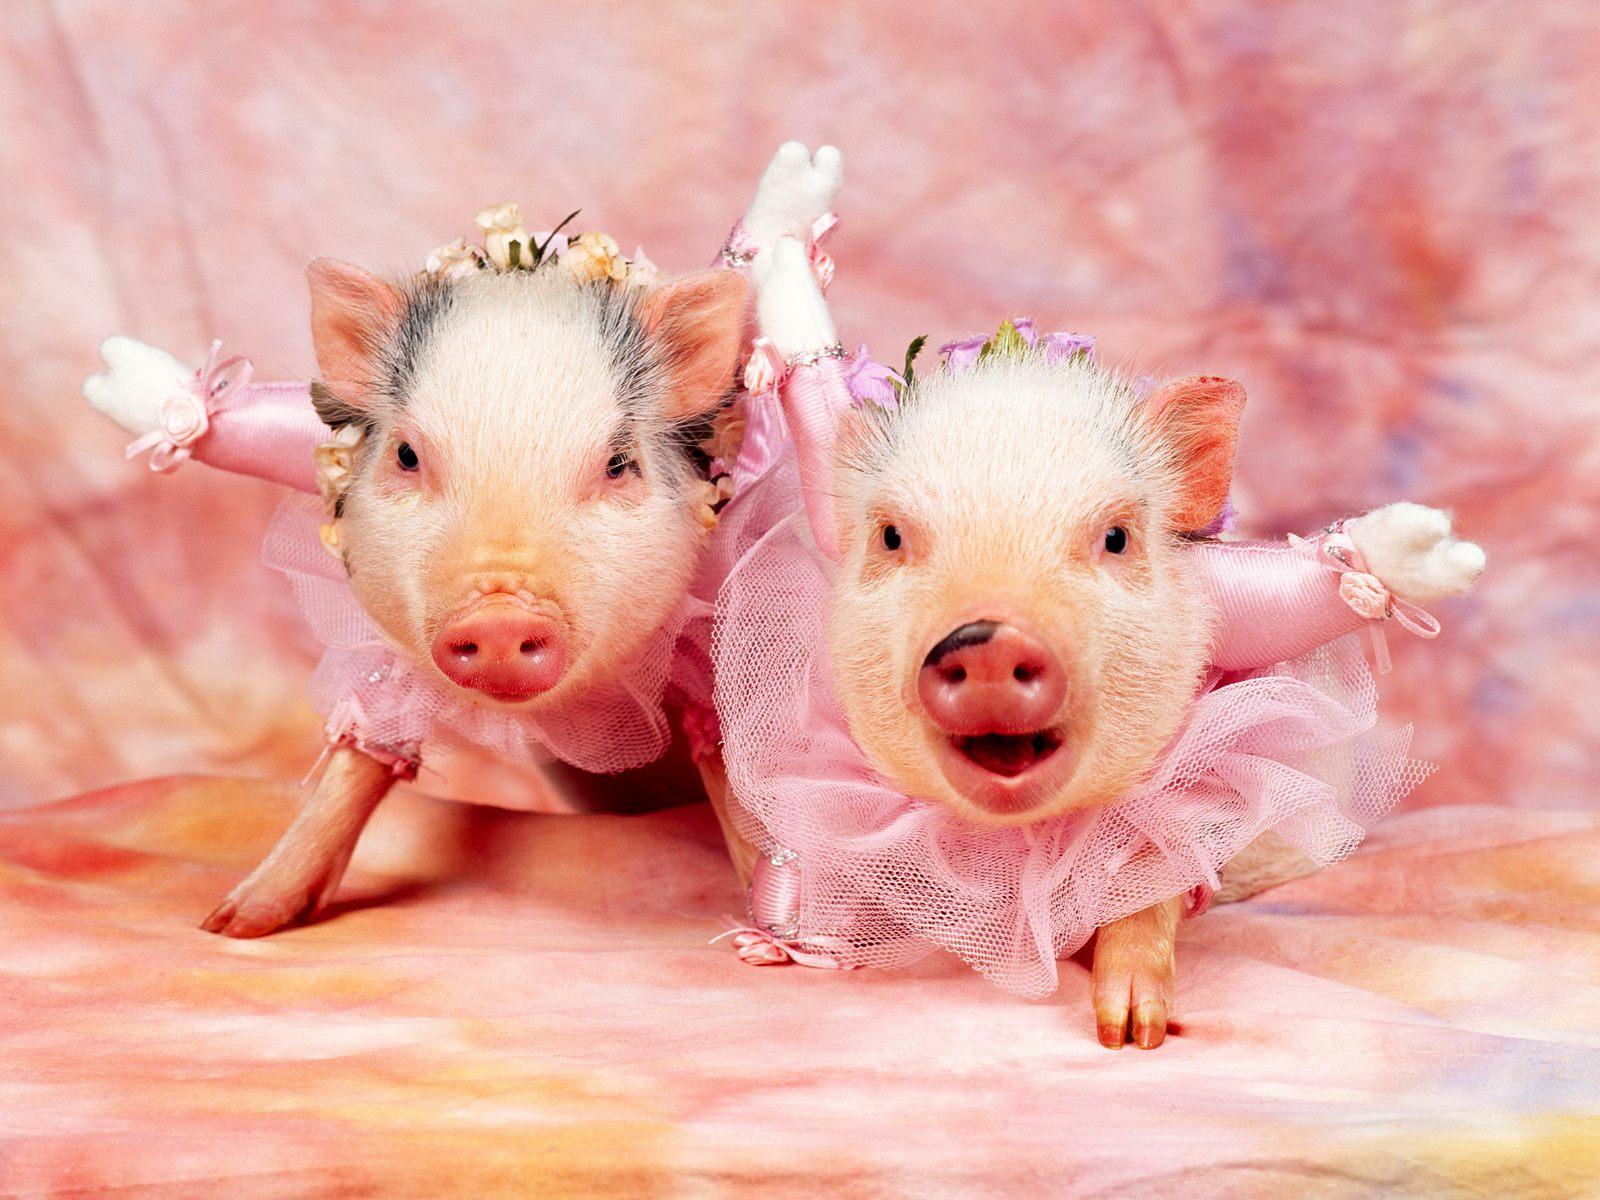 pigs wallpapers pigs wallpapers pigs wallpapers pigs wallpapers pigs 1600x1200